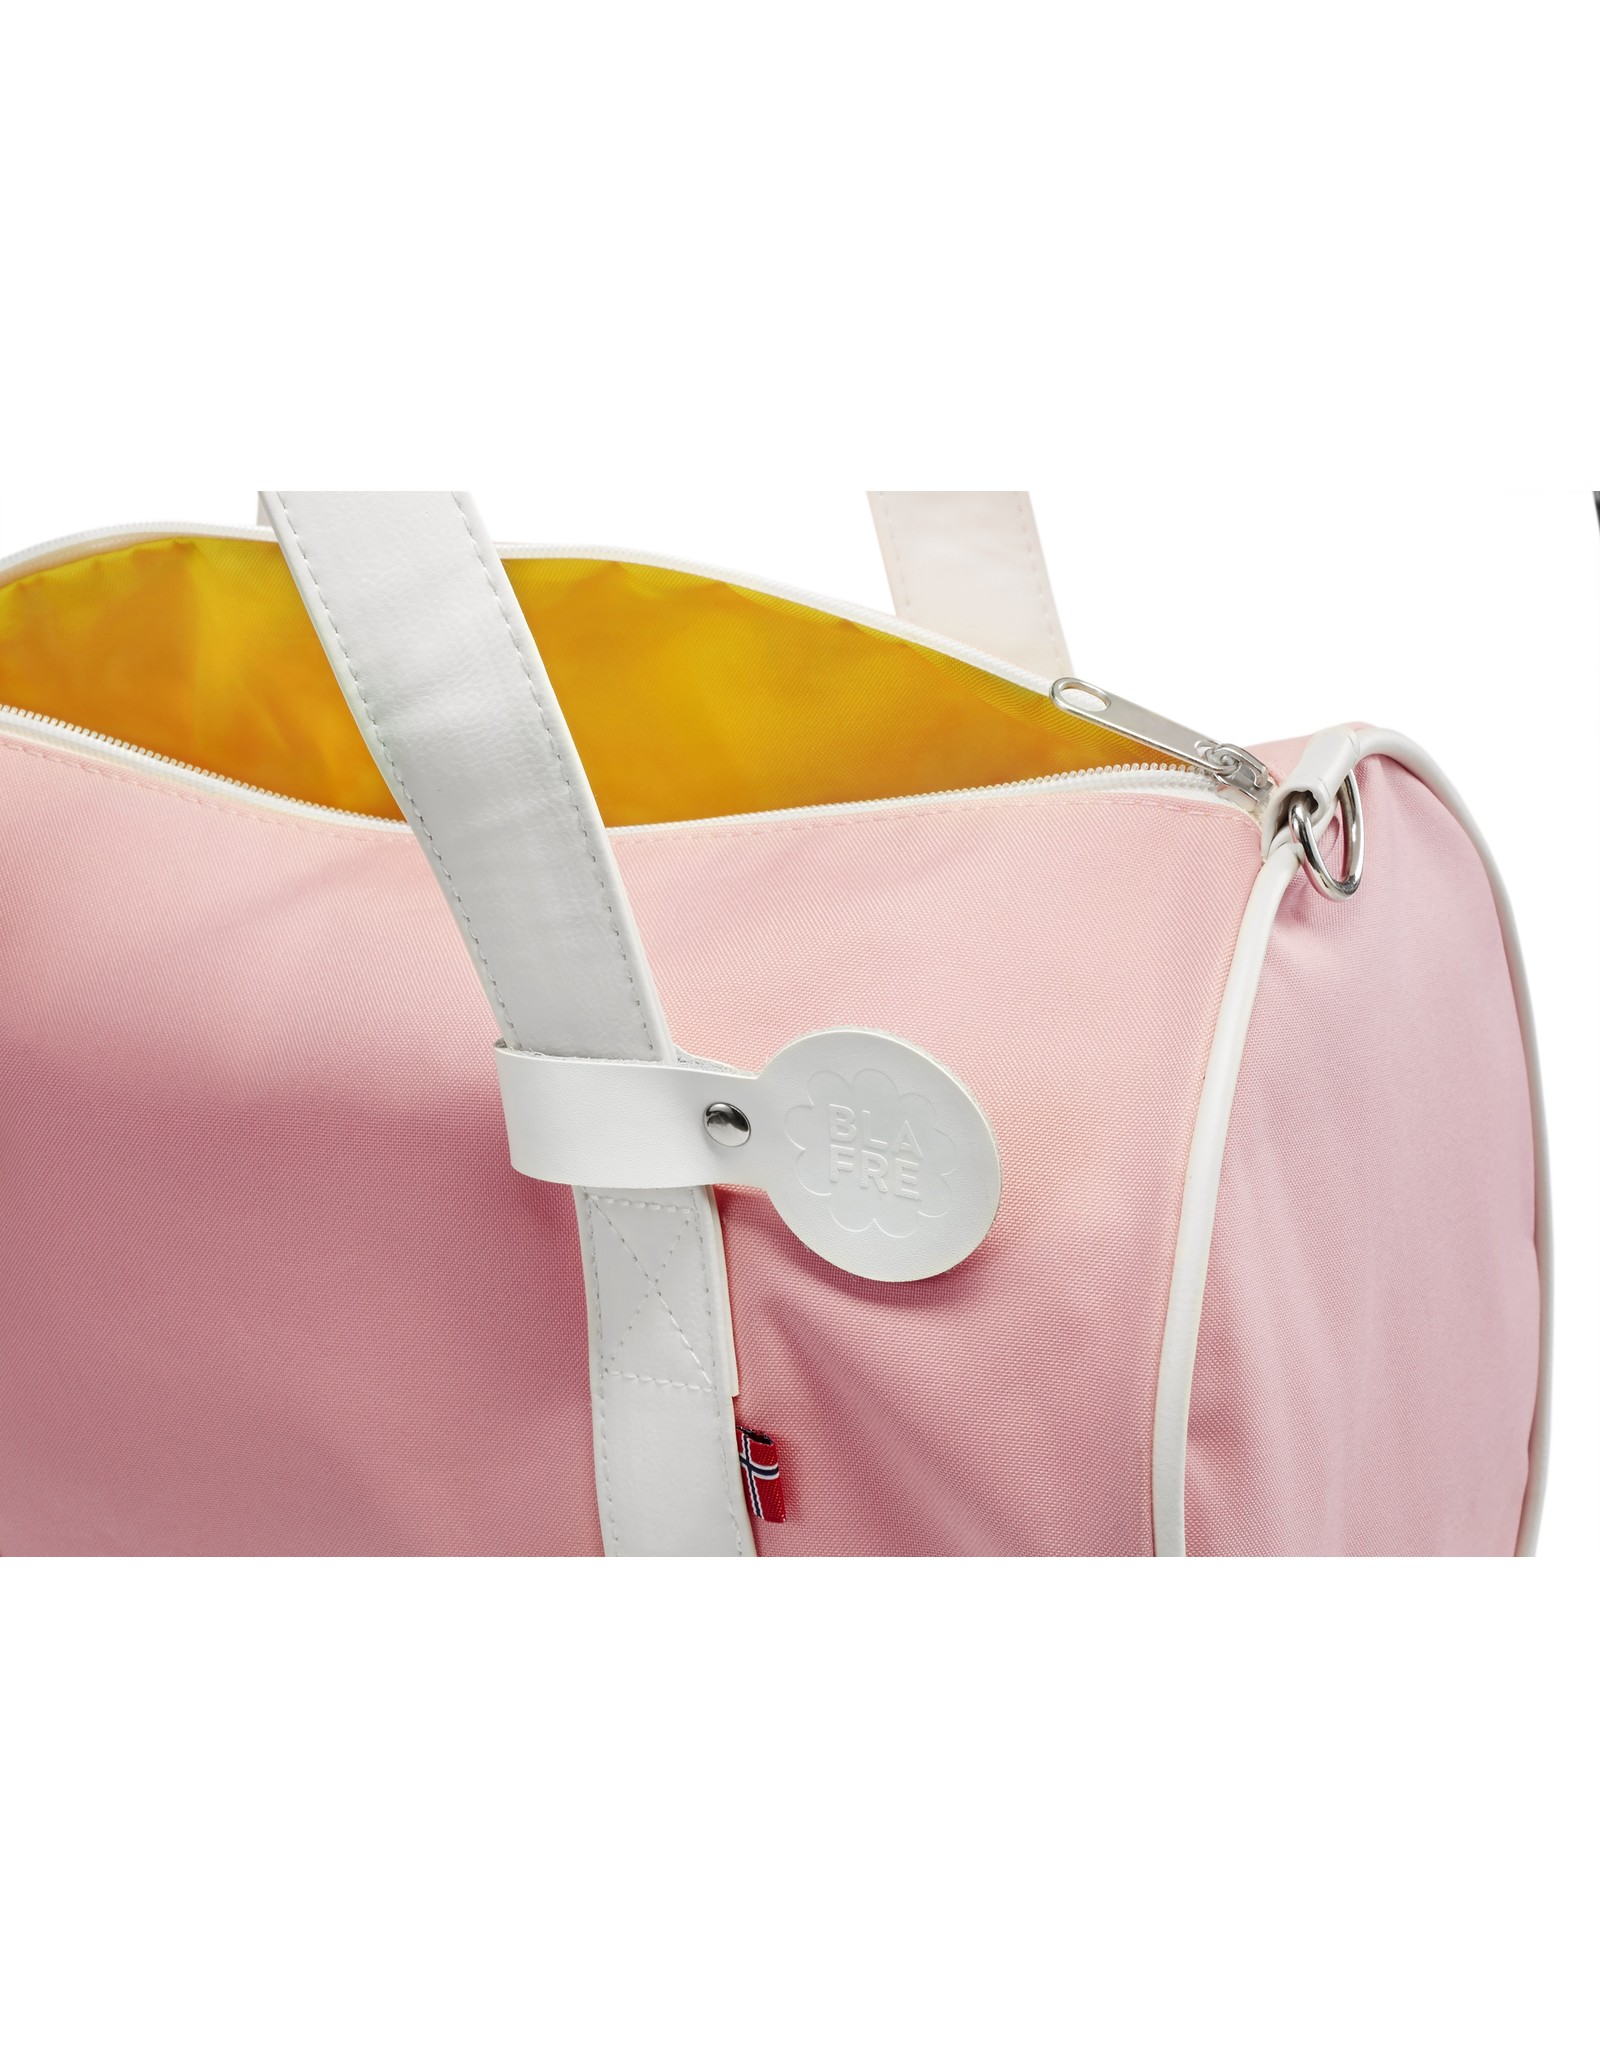 BLAFRE Blafre sac rose